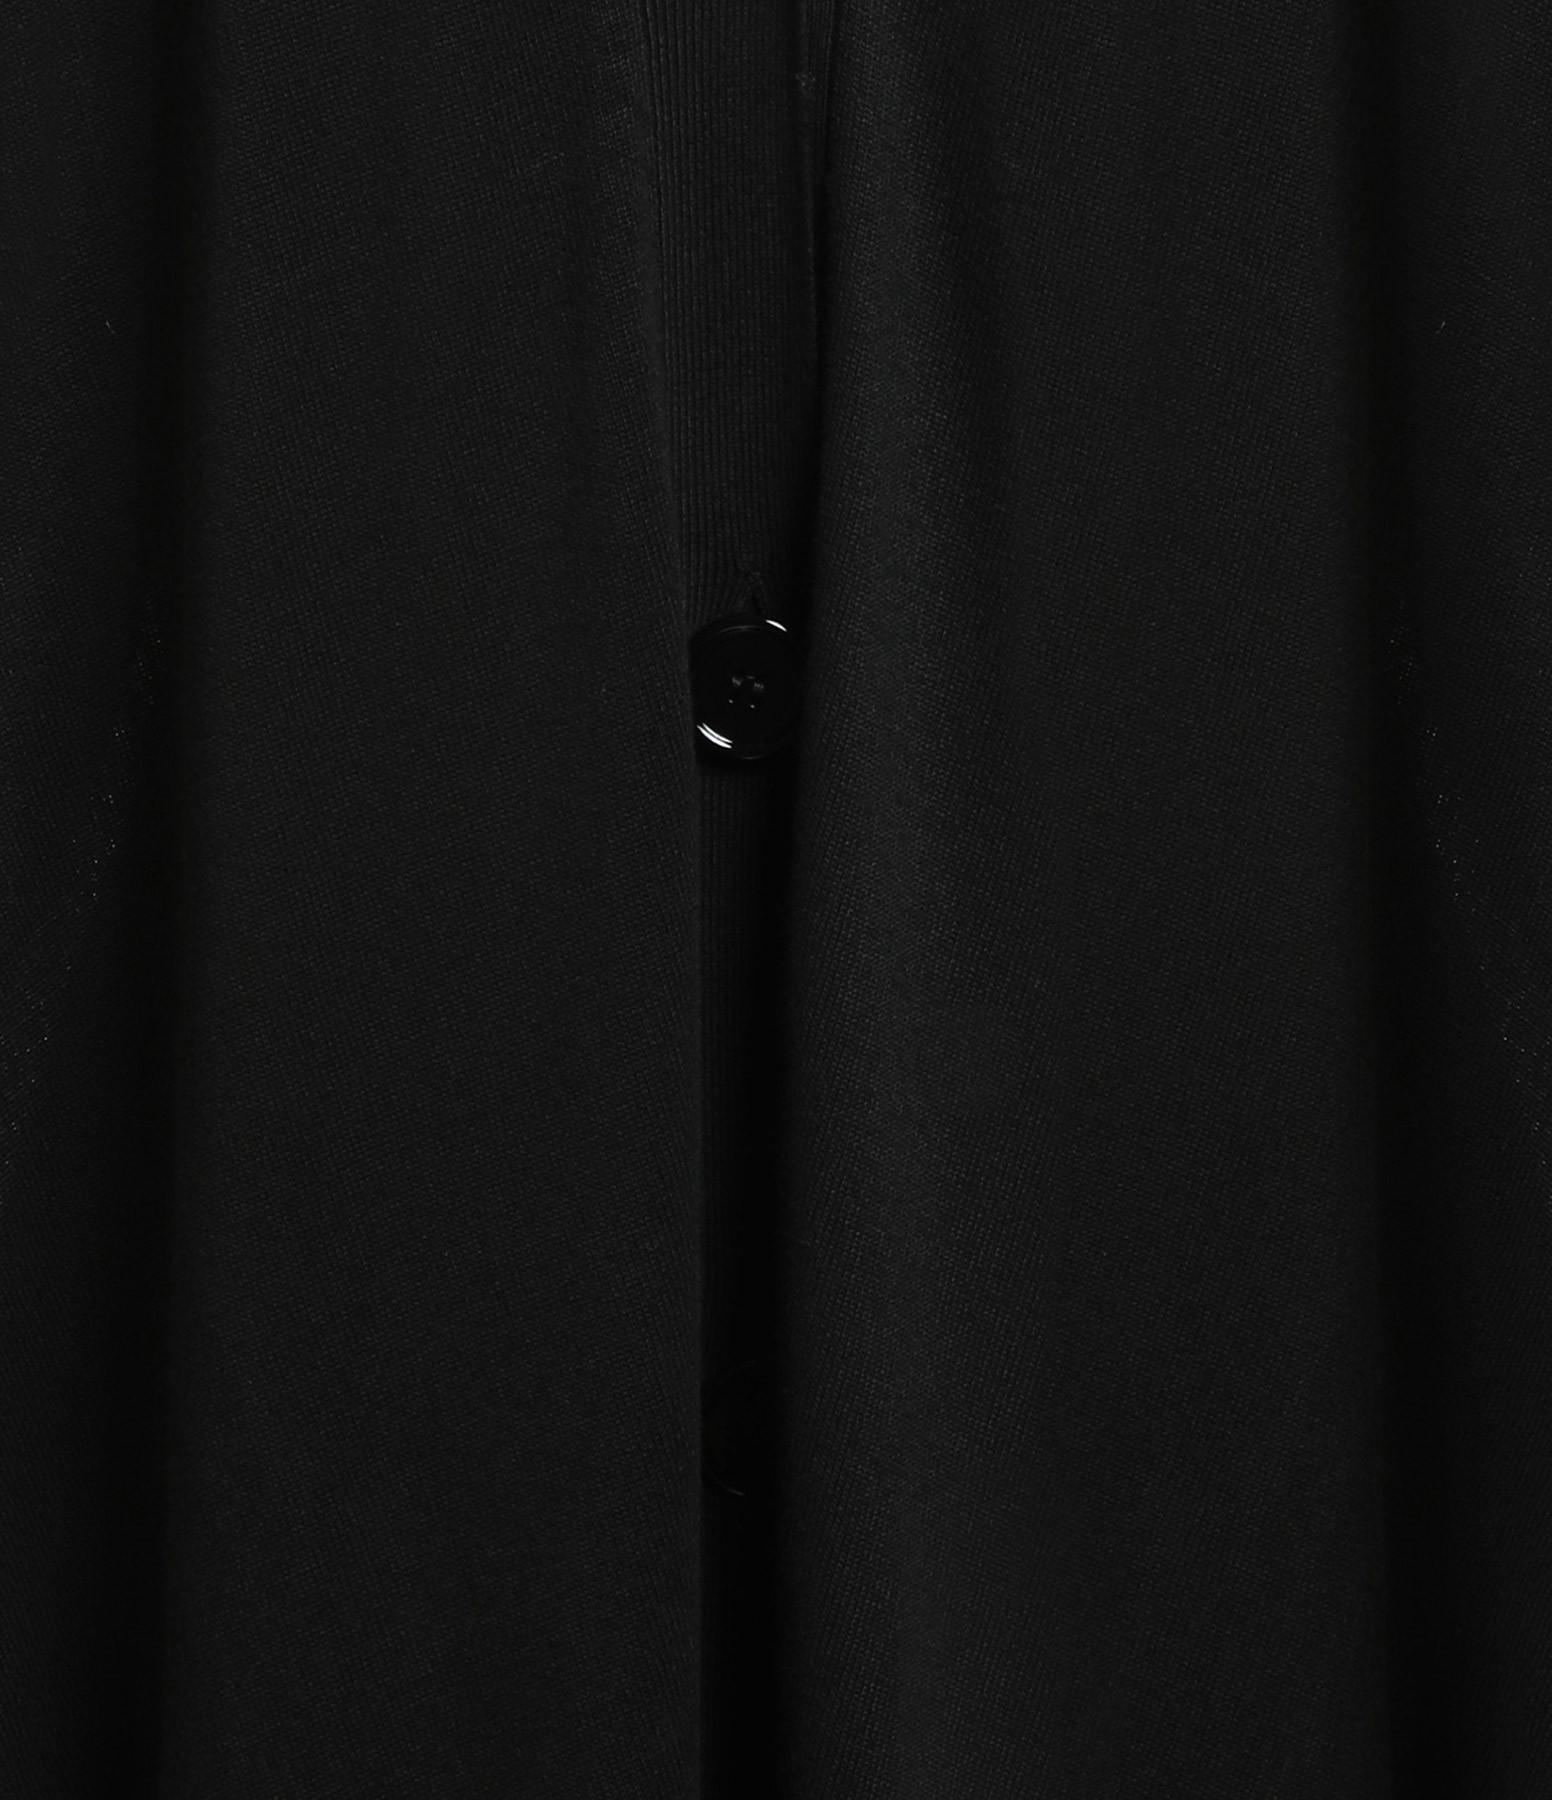 MM6 MAISON MARGIELA - Gilet Long Margiela Noir Blanc